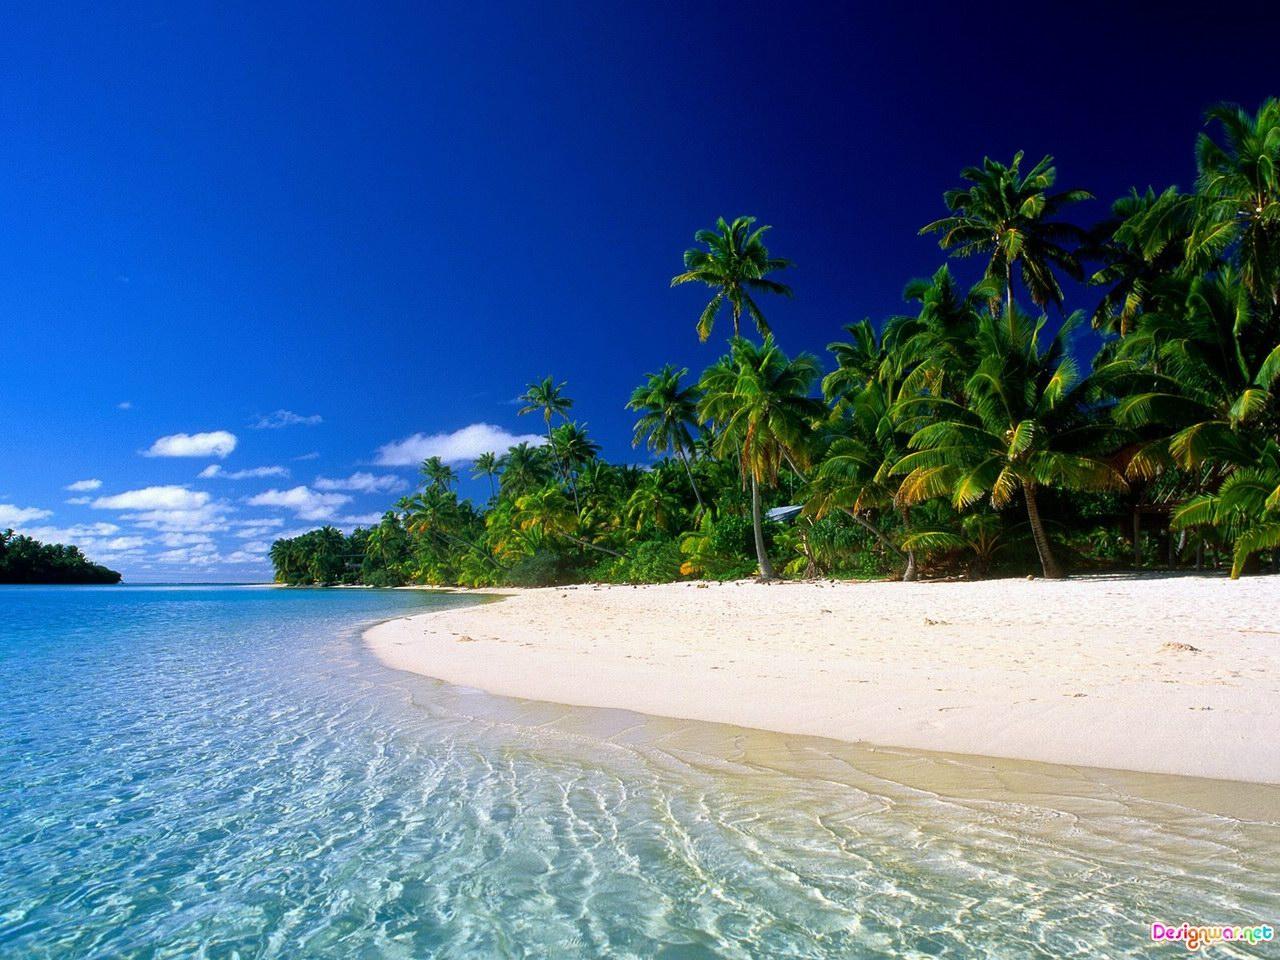 Tropical Paradise Wallpaper High Resolution: Tropical Beach HD Wallpaper